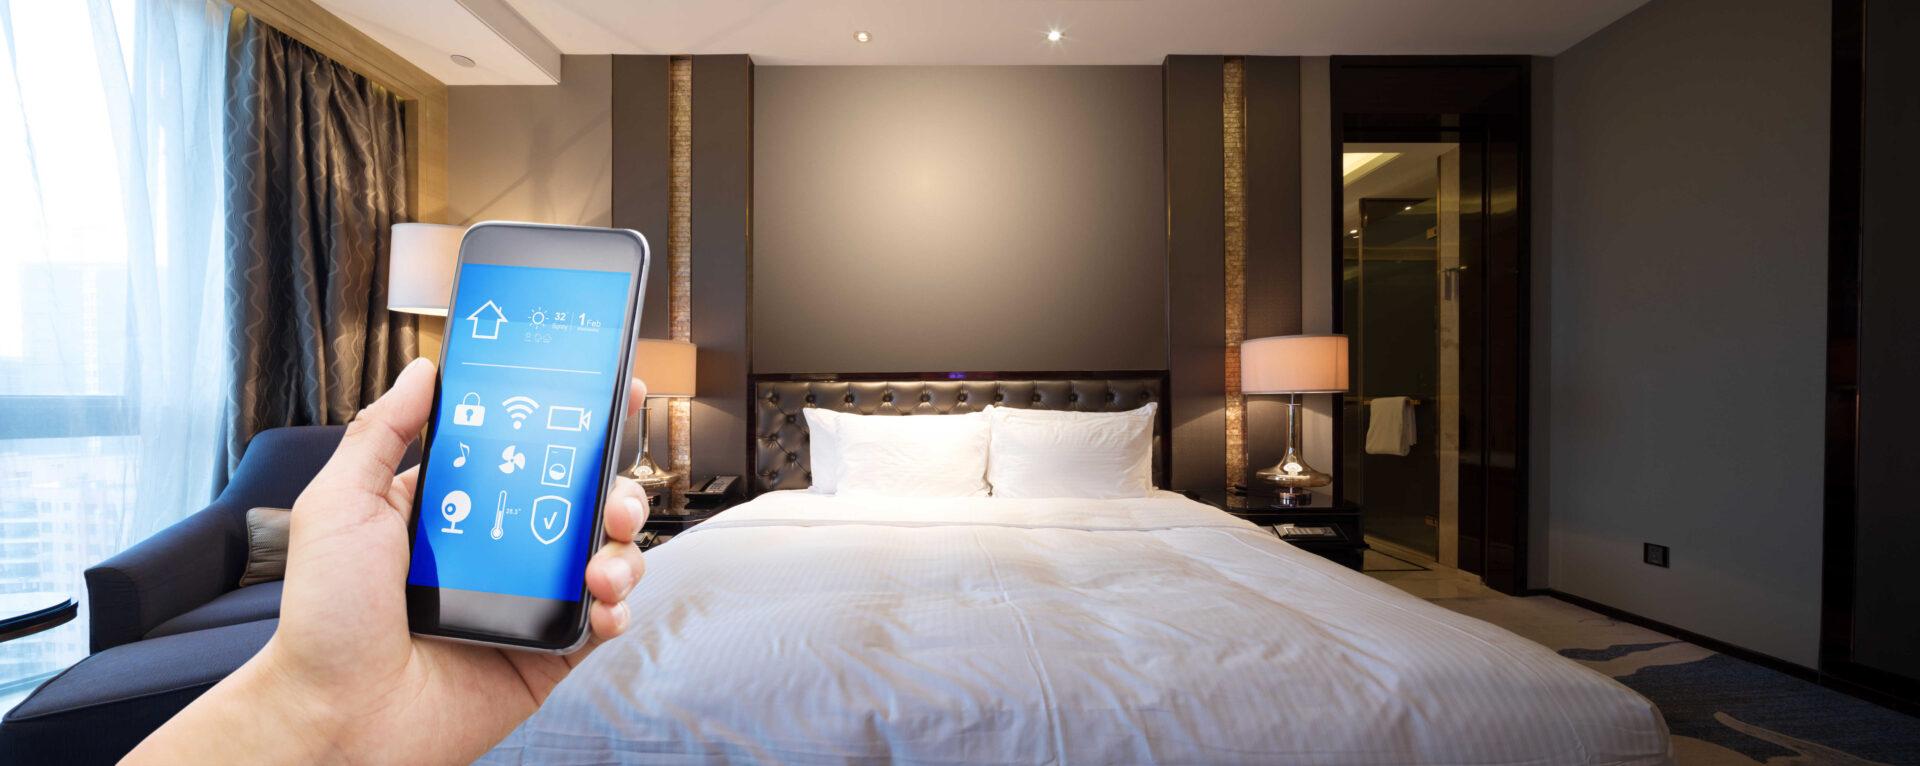 hotel_technology